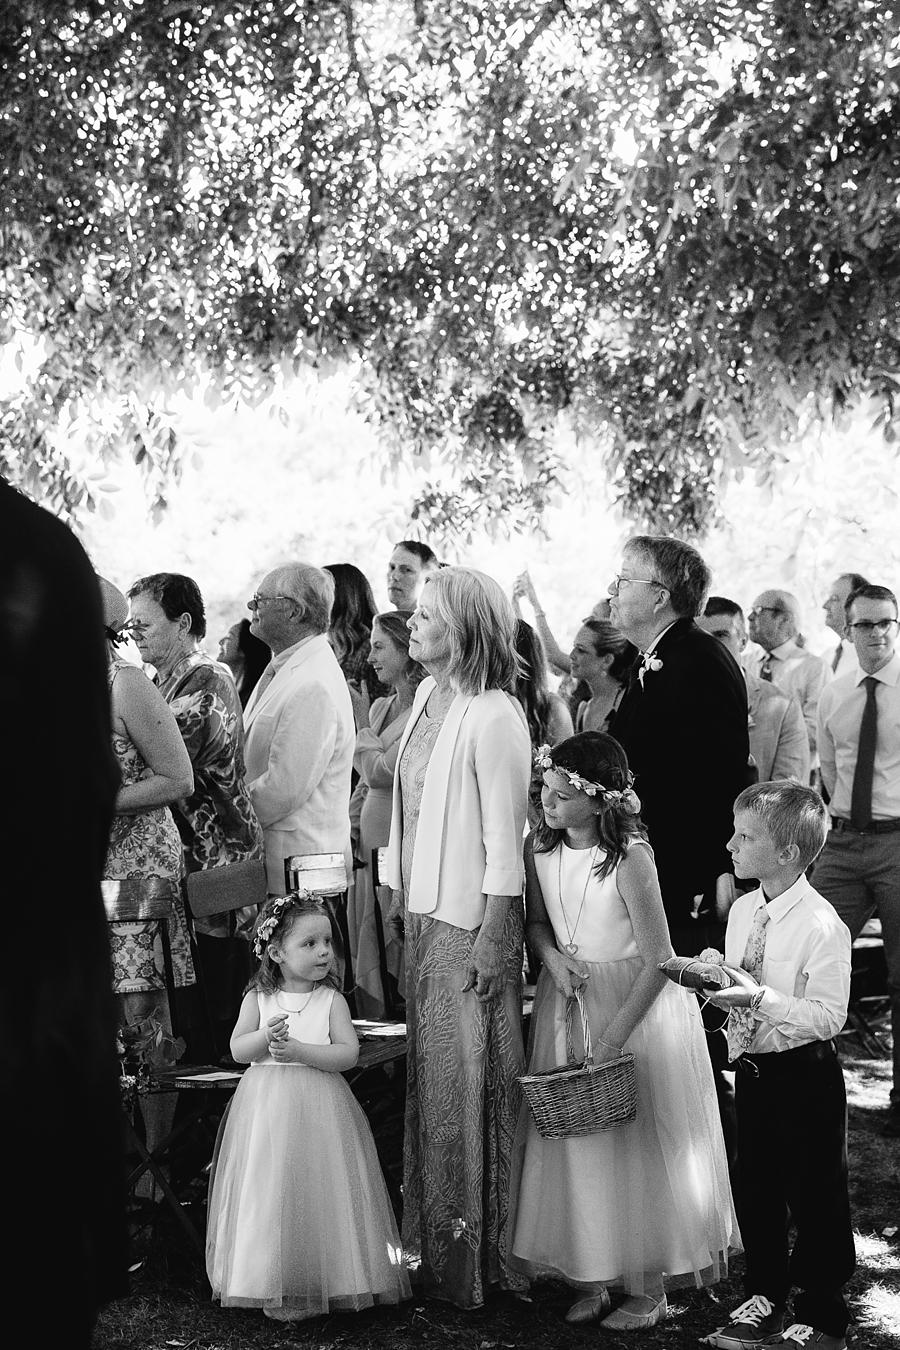 triple-s-ranch-wedding-calistoga-california-abi-q-photography-_0157.jpg